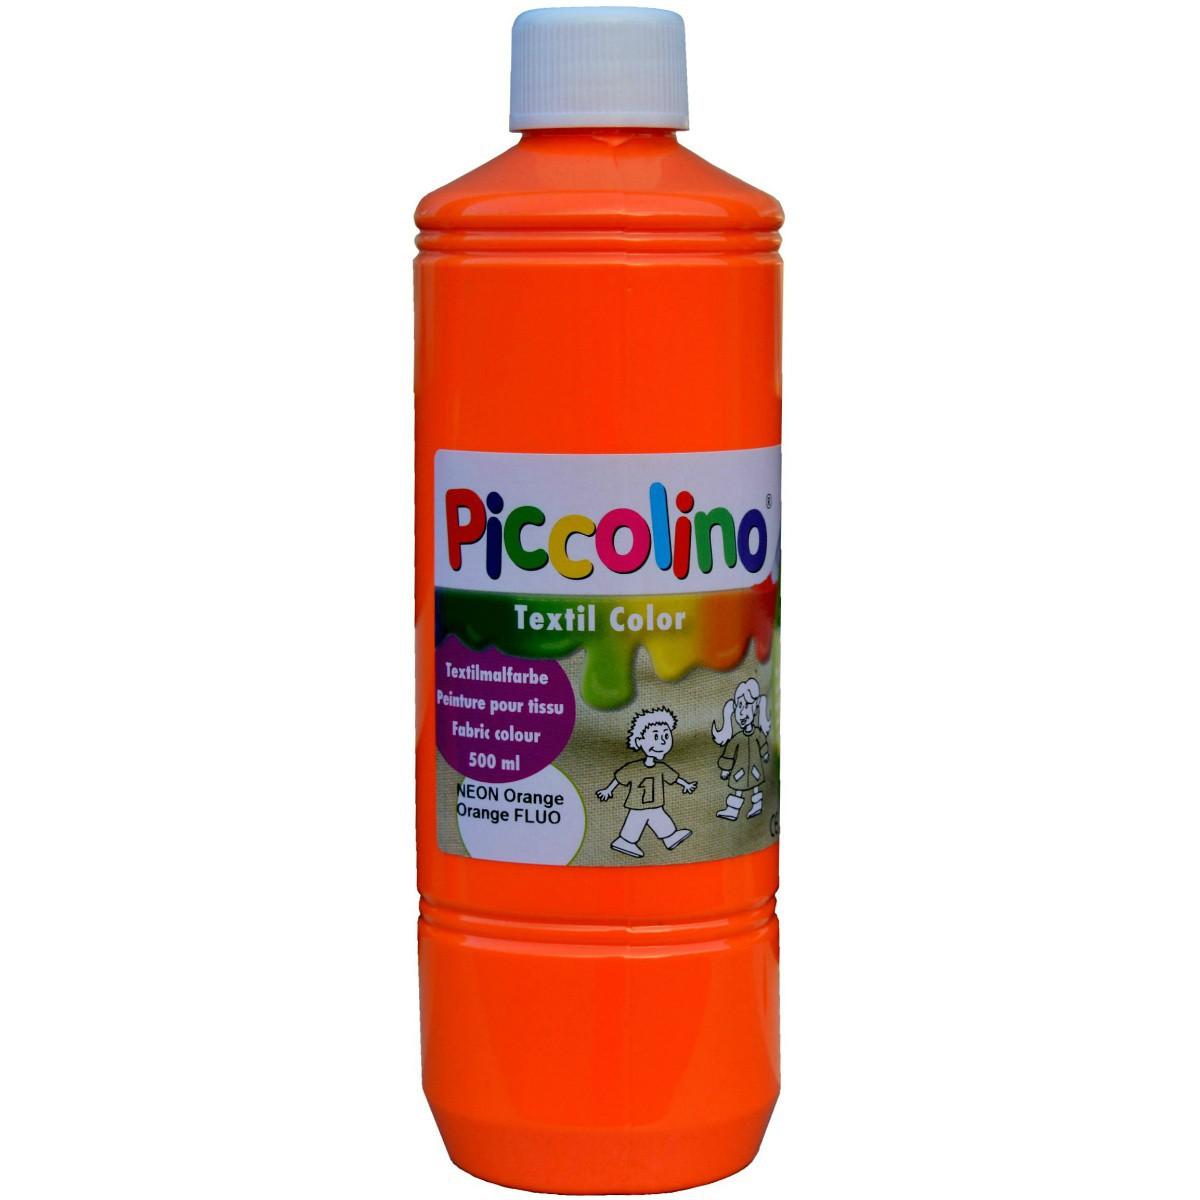 PICCOLINO Stoffmalfarben Neon - Textilfarben Set 5 Neon-Farben je 500ml